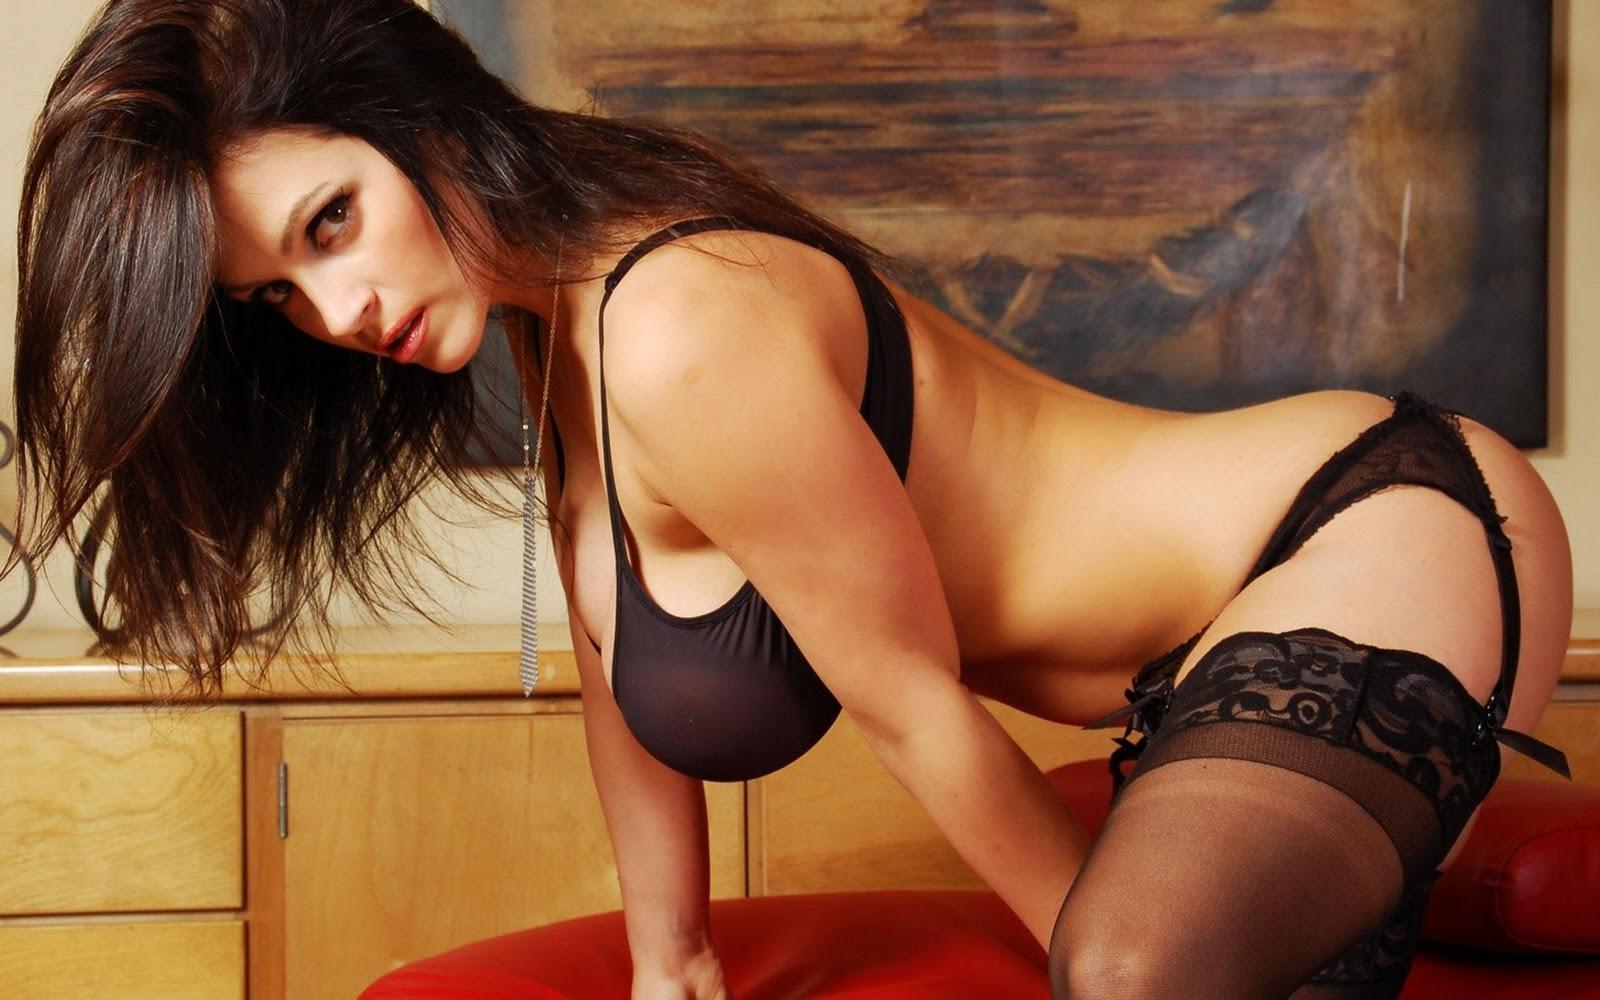 Super Sexy Nude Women